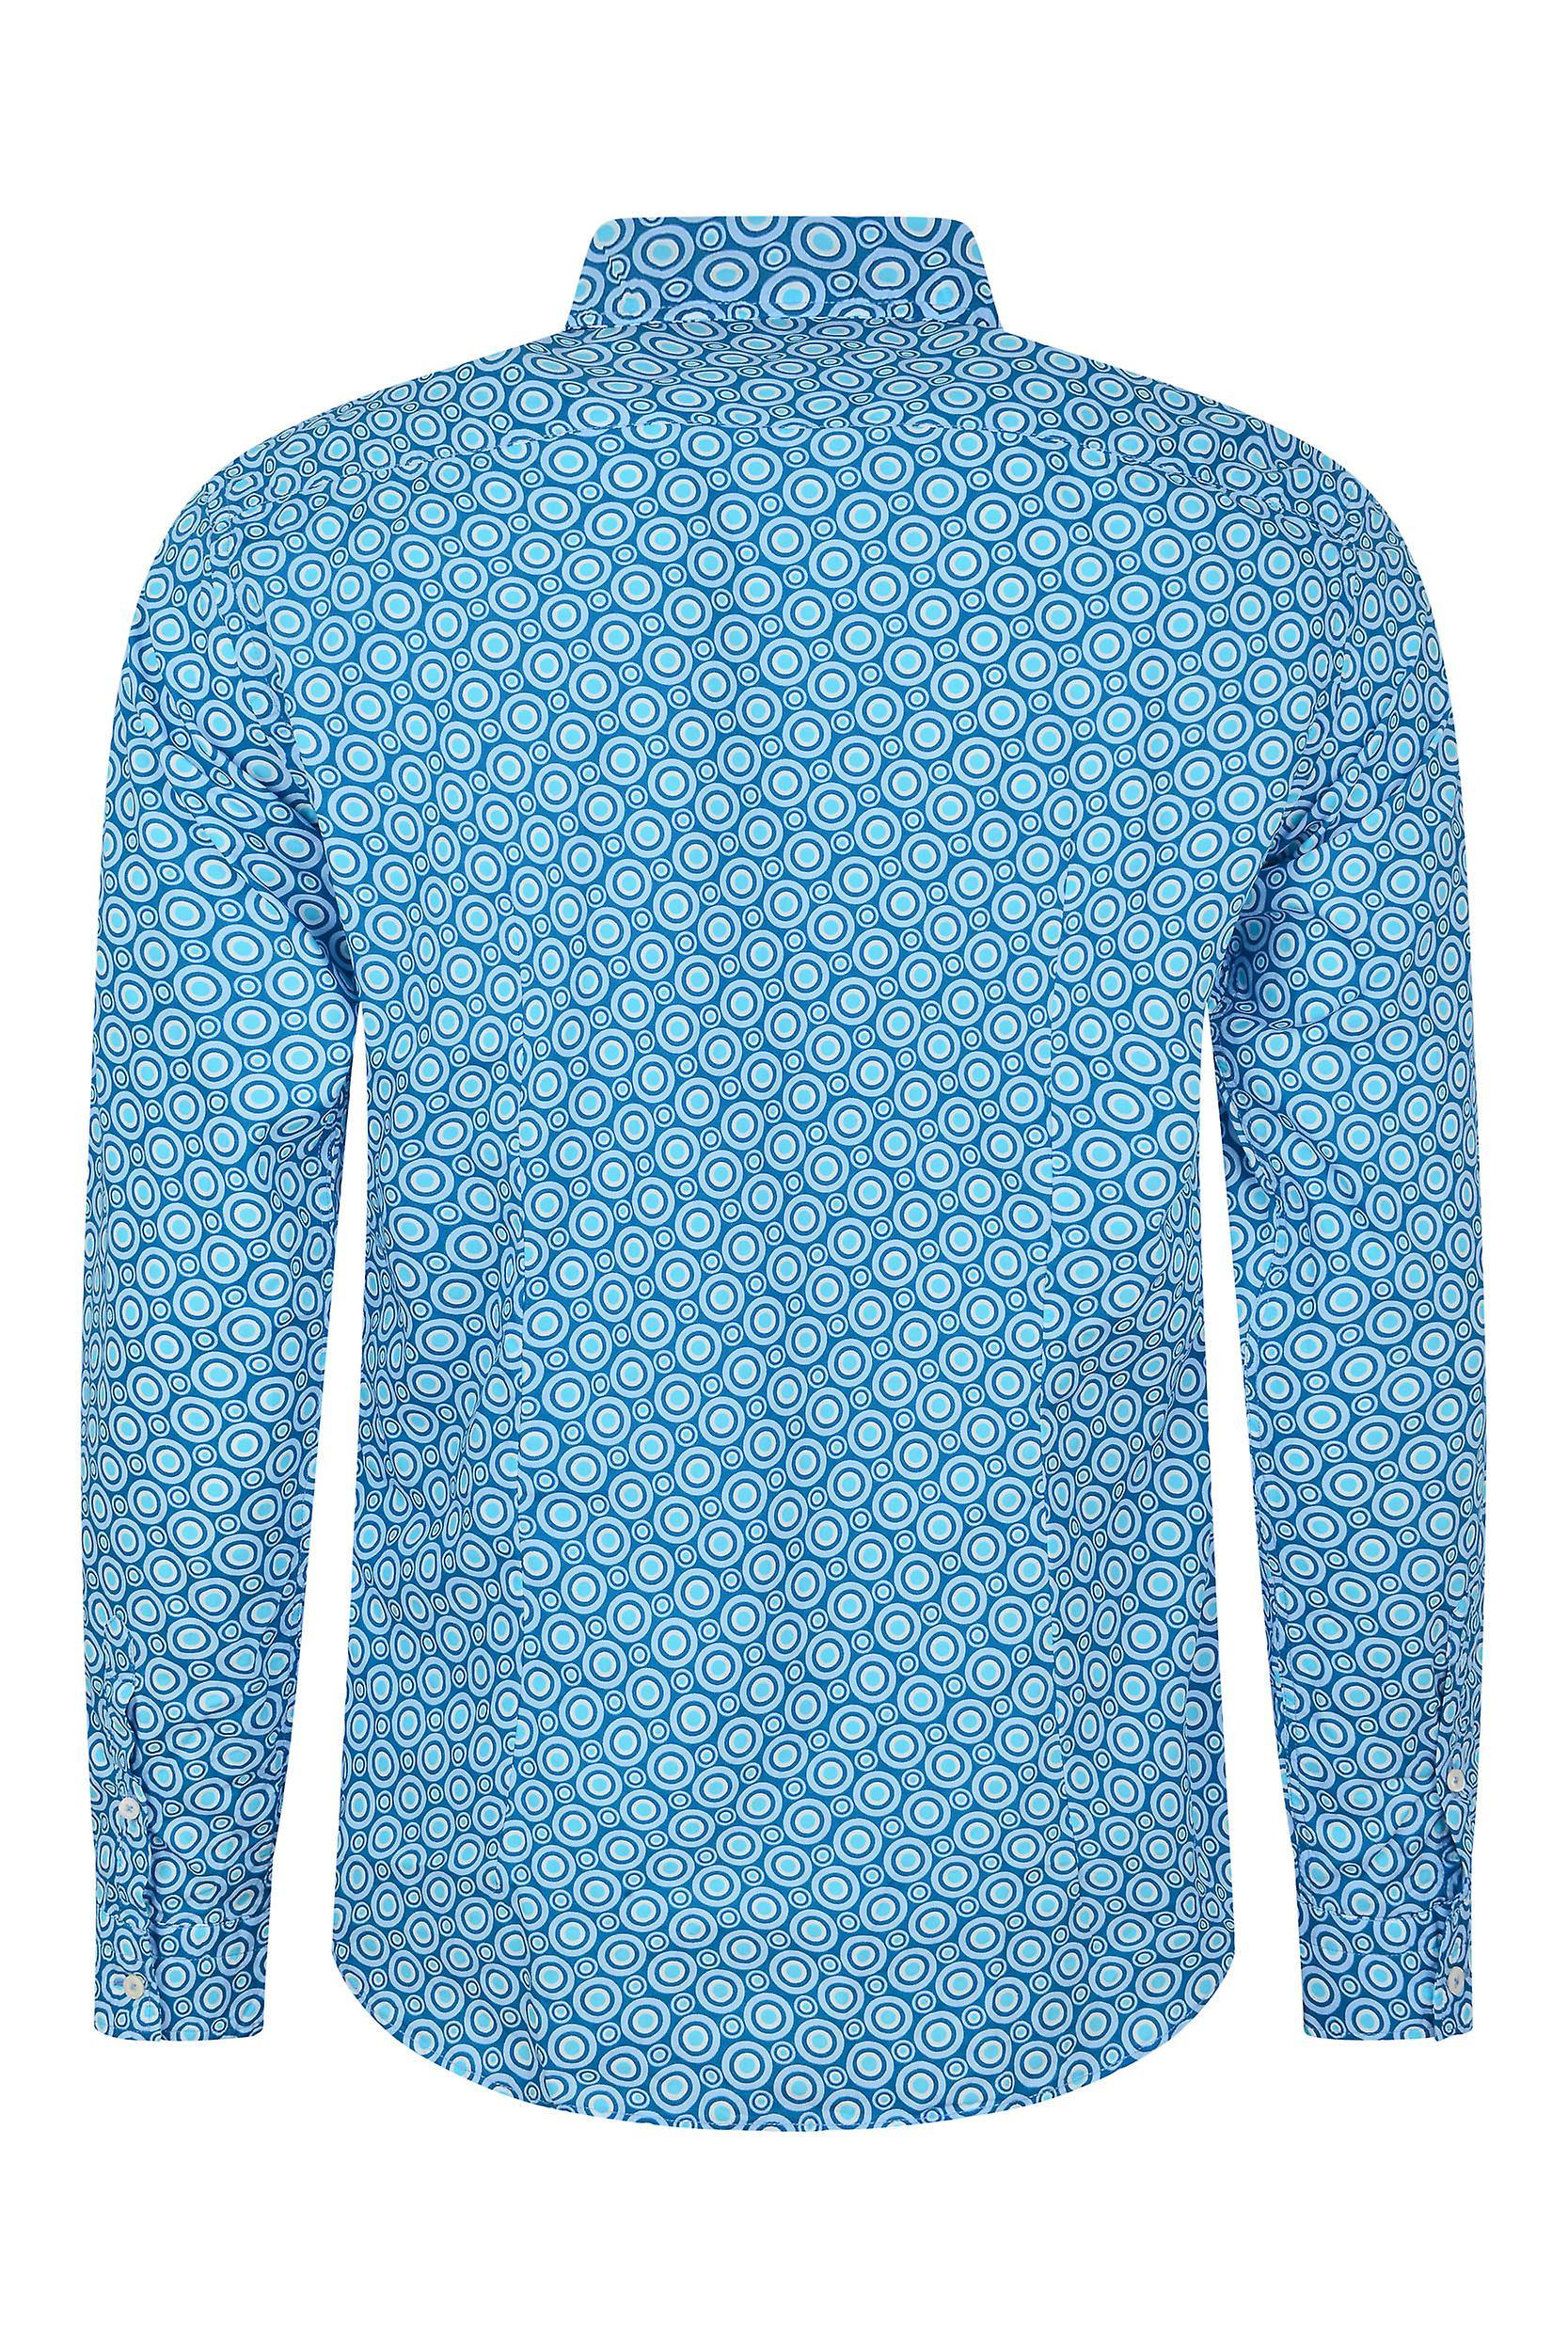 Fabio Giovanni Ribezzo Shirt - Mens Italian Casual Stylish Bold Pattern Shirt - Long Sleeve